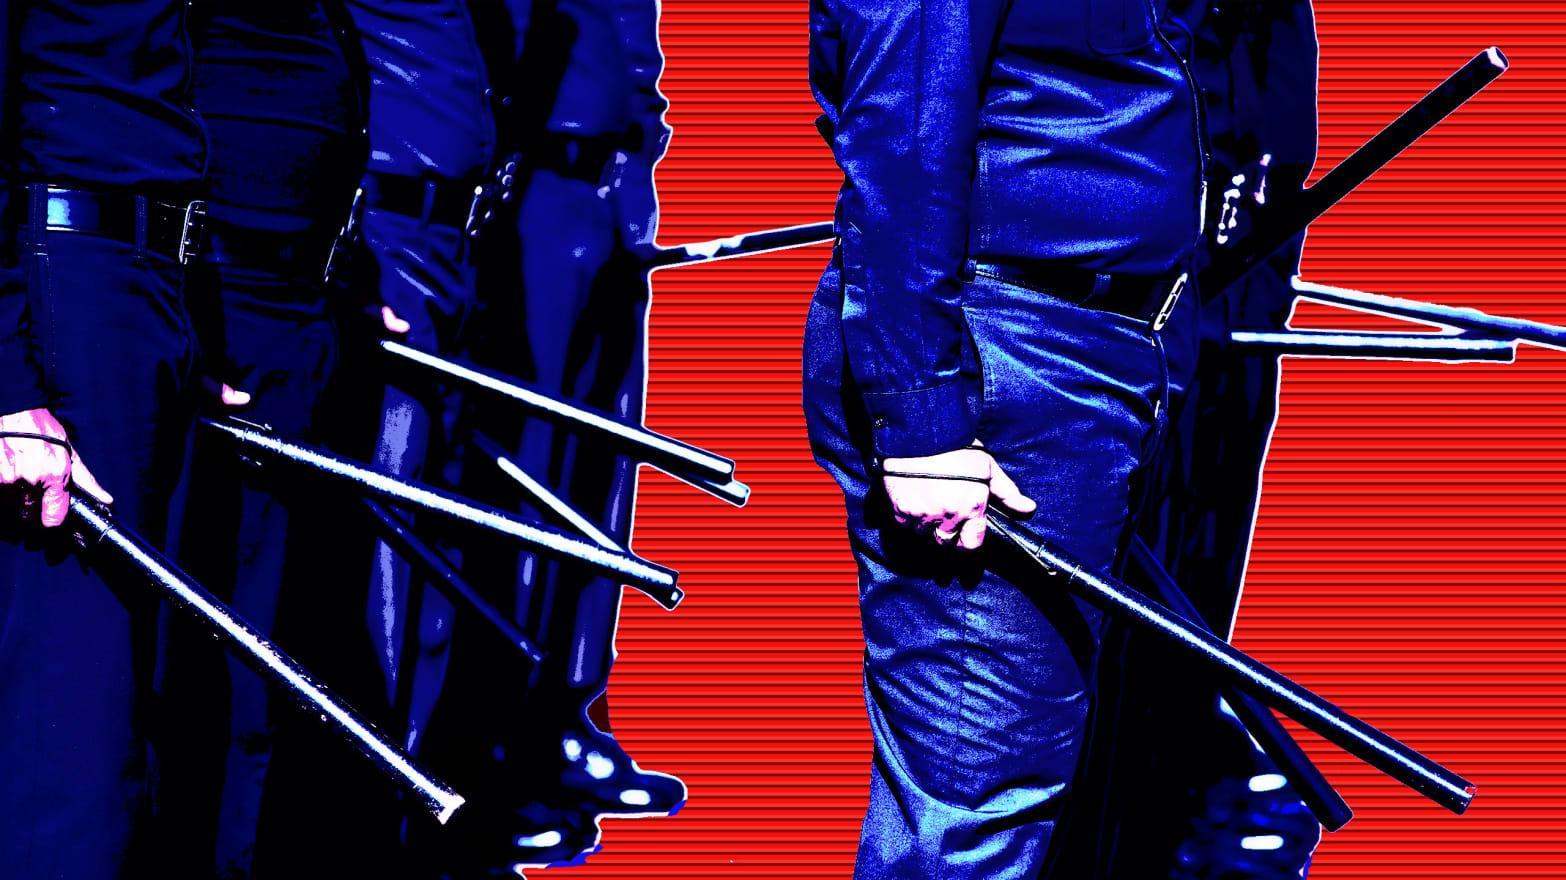 Towards authoritarianism